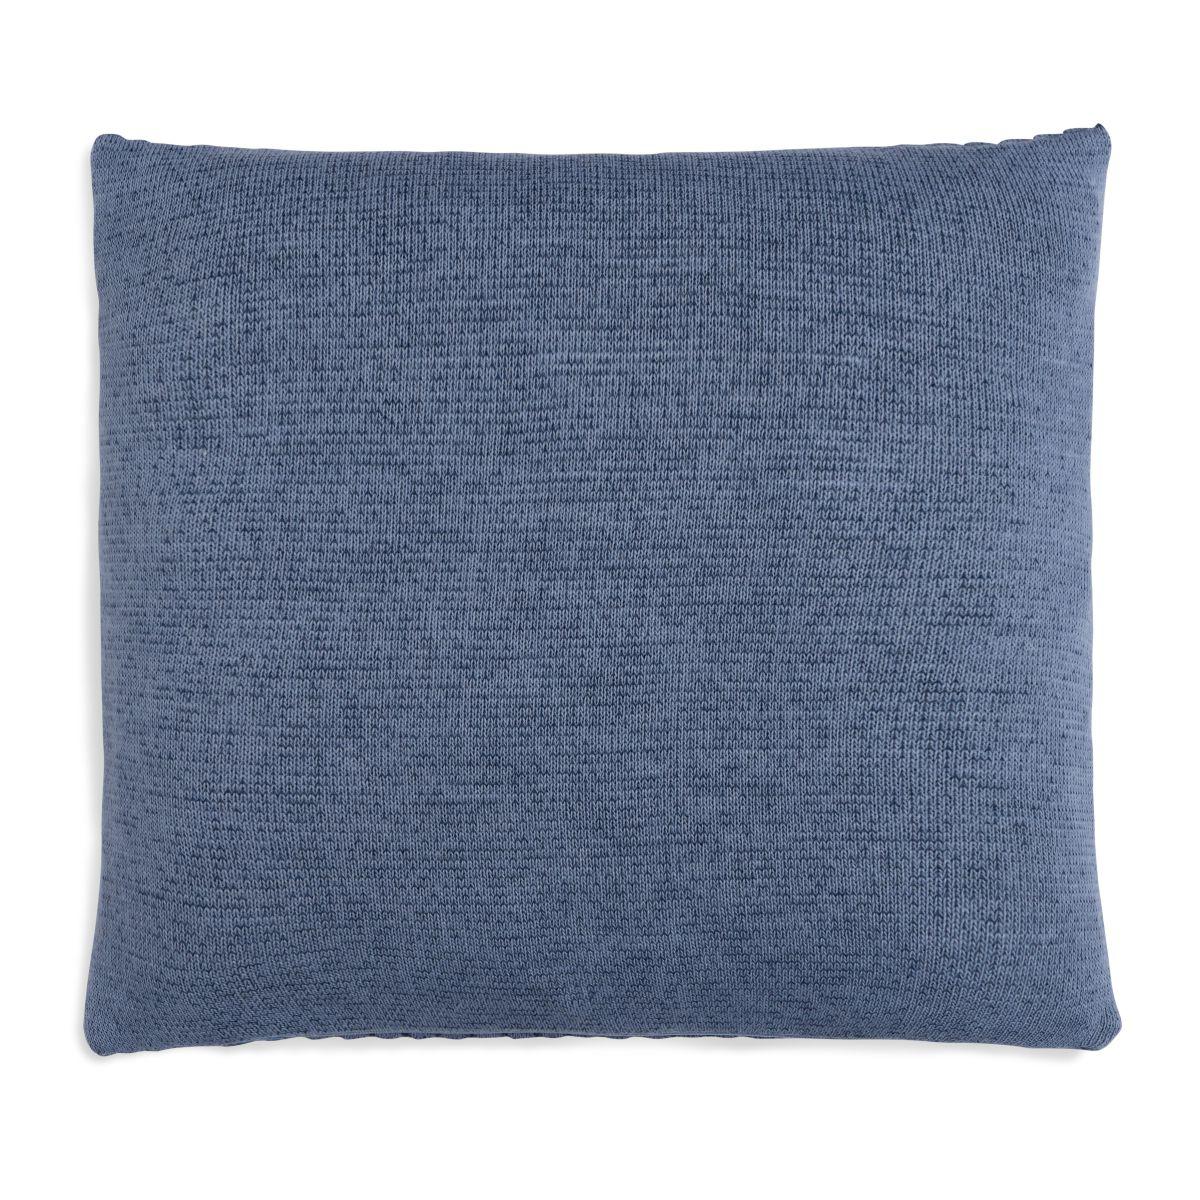 juul cushion jeansindigo 50x50